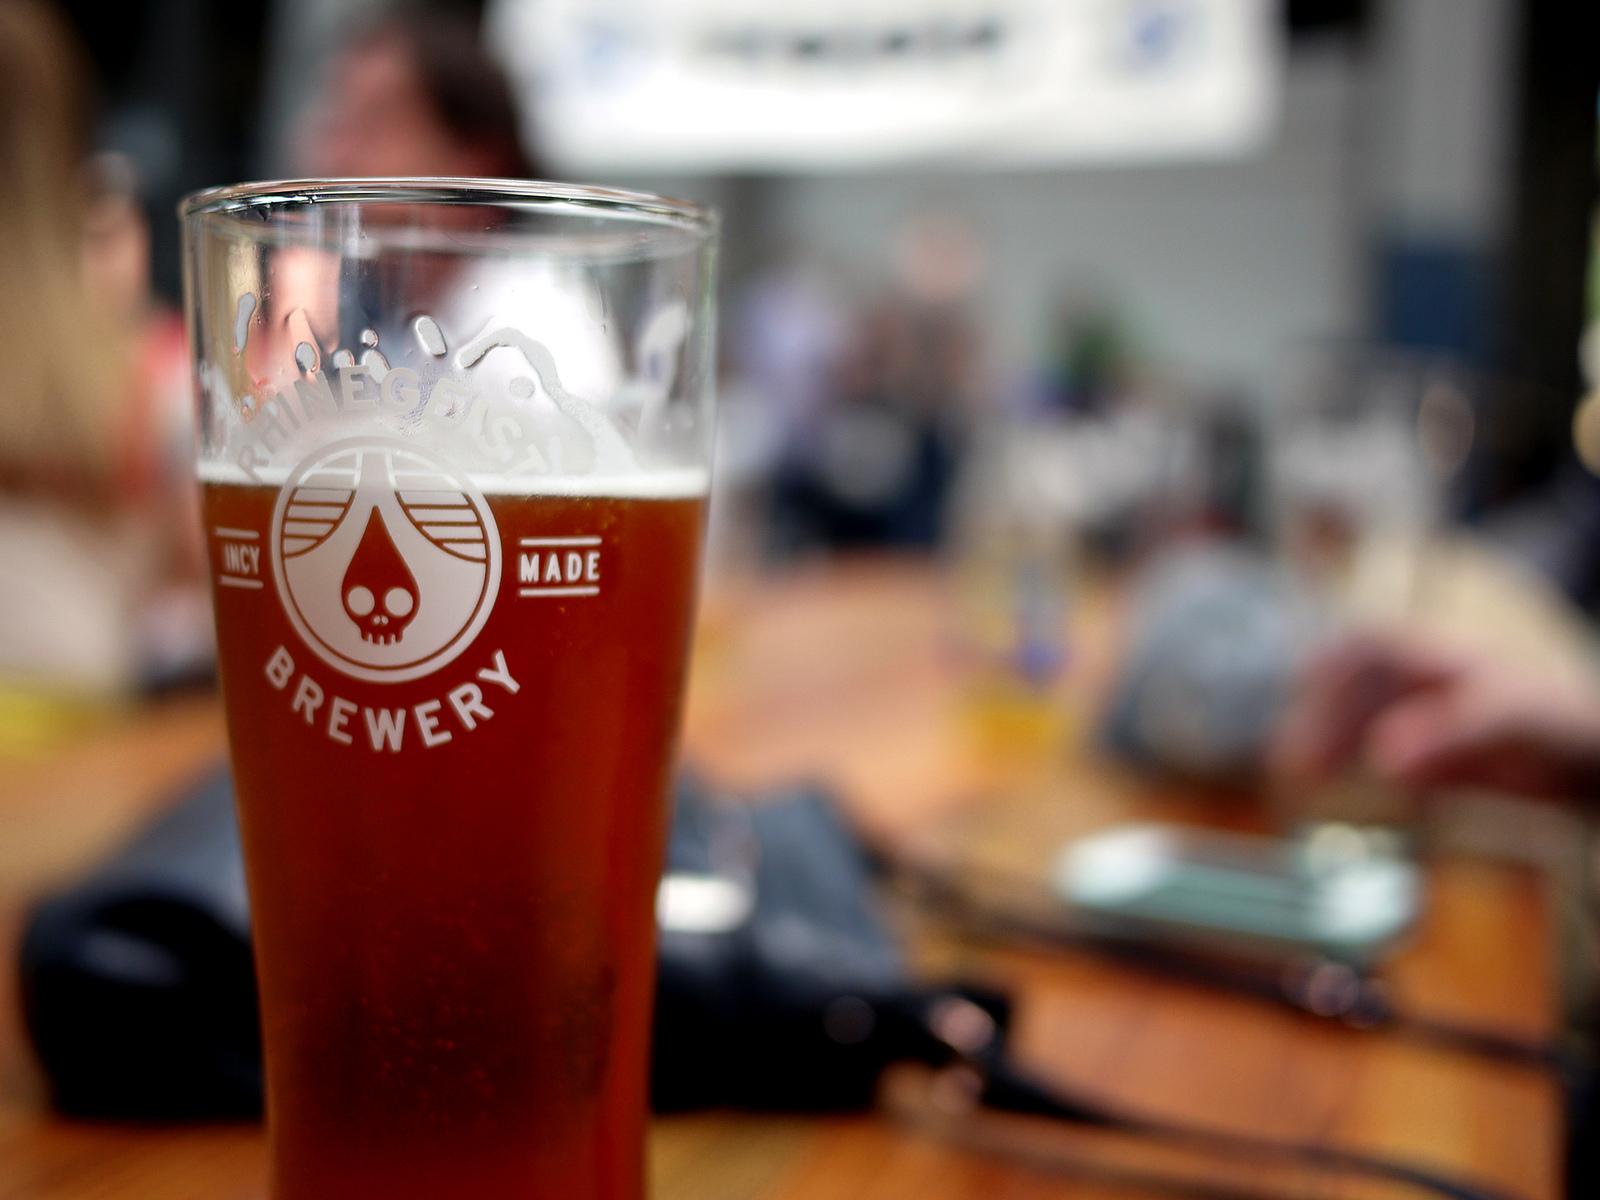 A mug of German beer. (Photo: 5chw4r7z/Flickr)